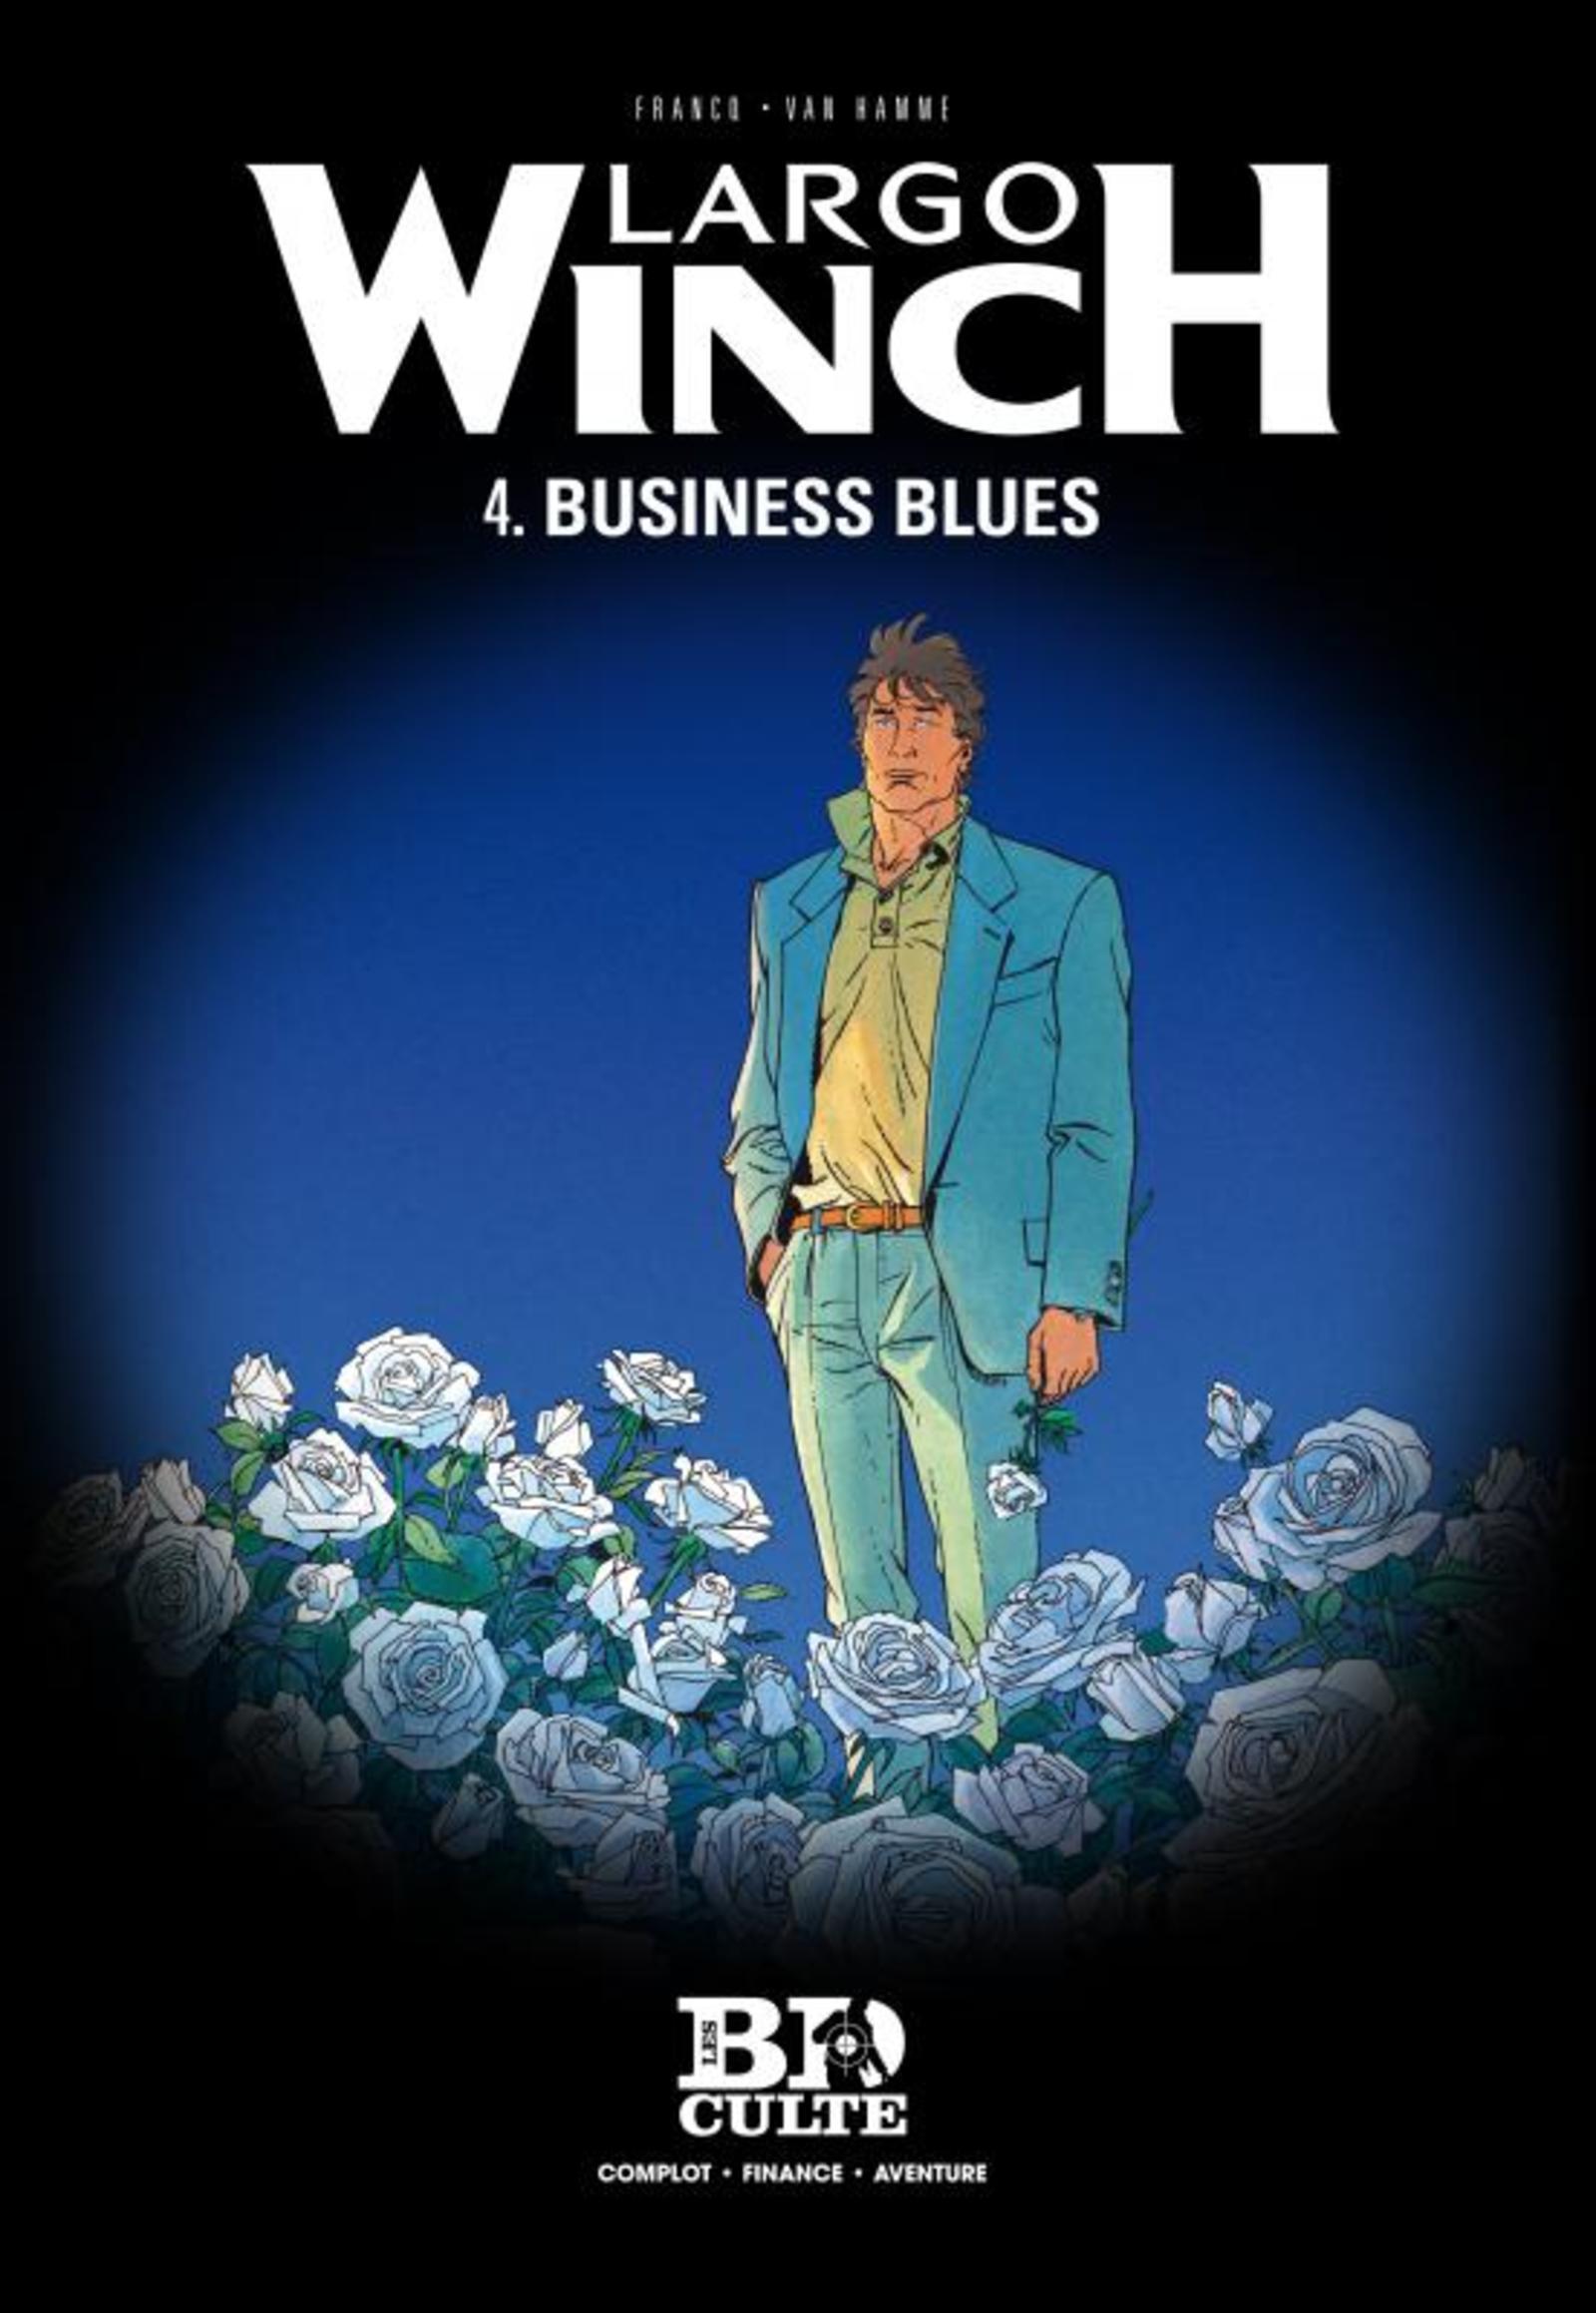 LARGO WINCH T4. BUSINESS BLUES